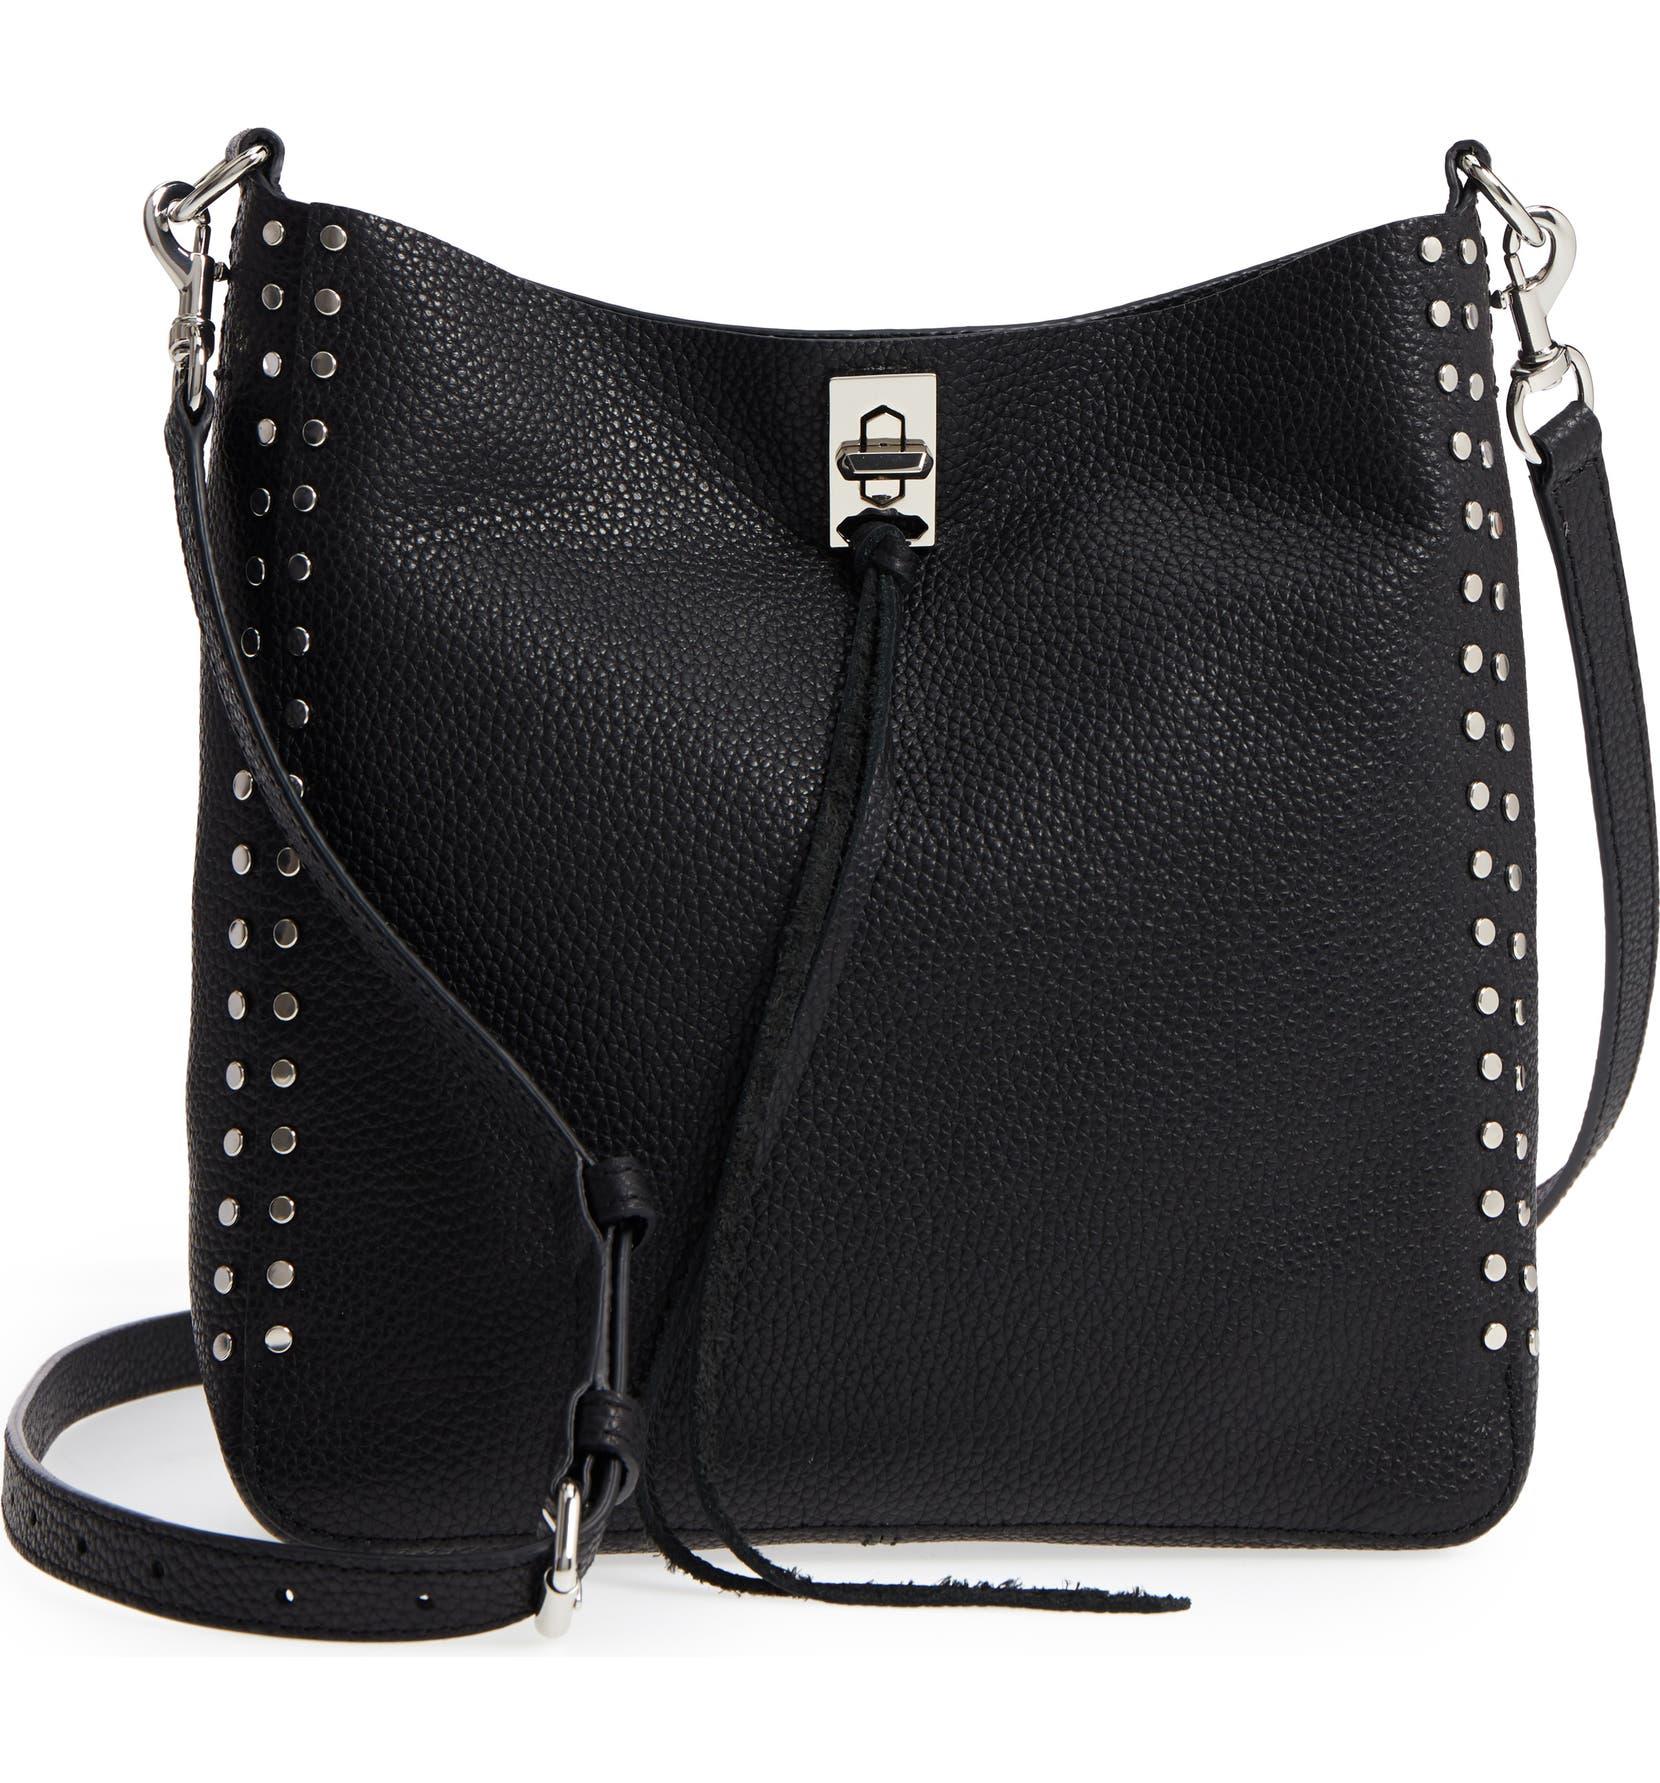 abbefec47 Rebecca Minkoff Small Darren Leather Feed Bag | Nordstrom